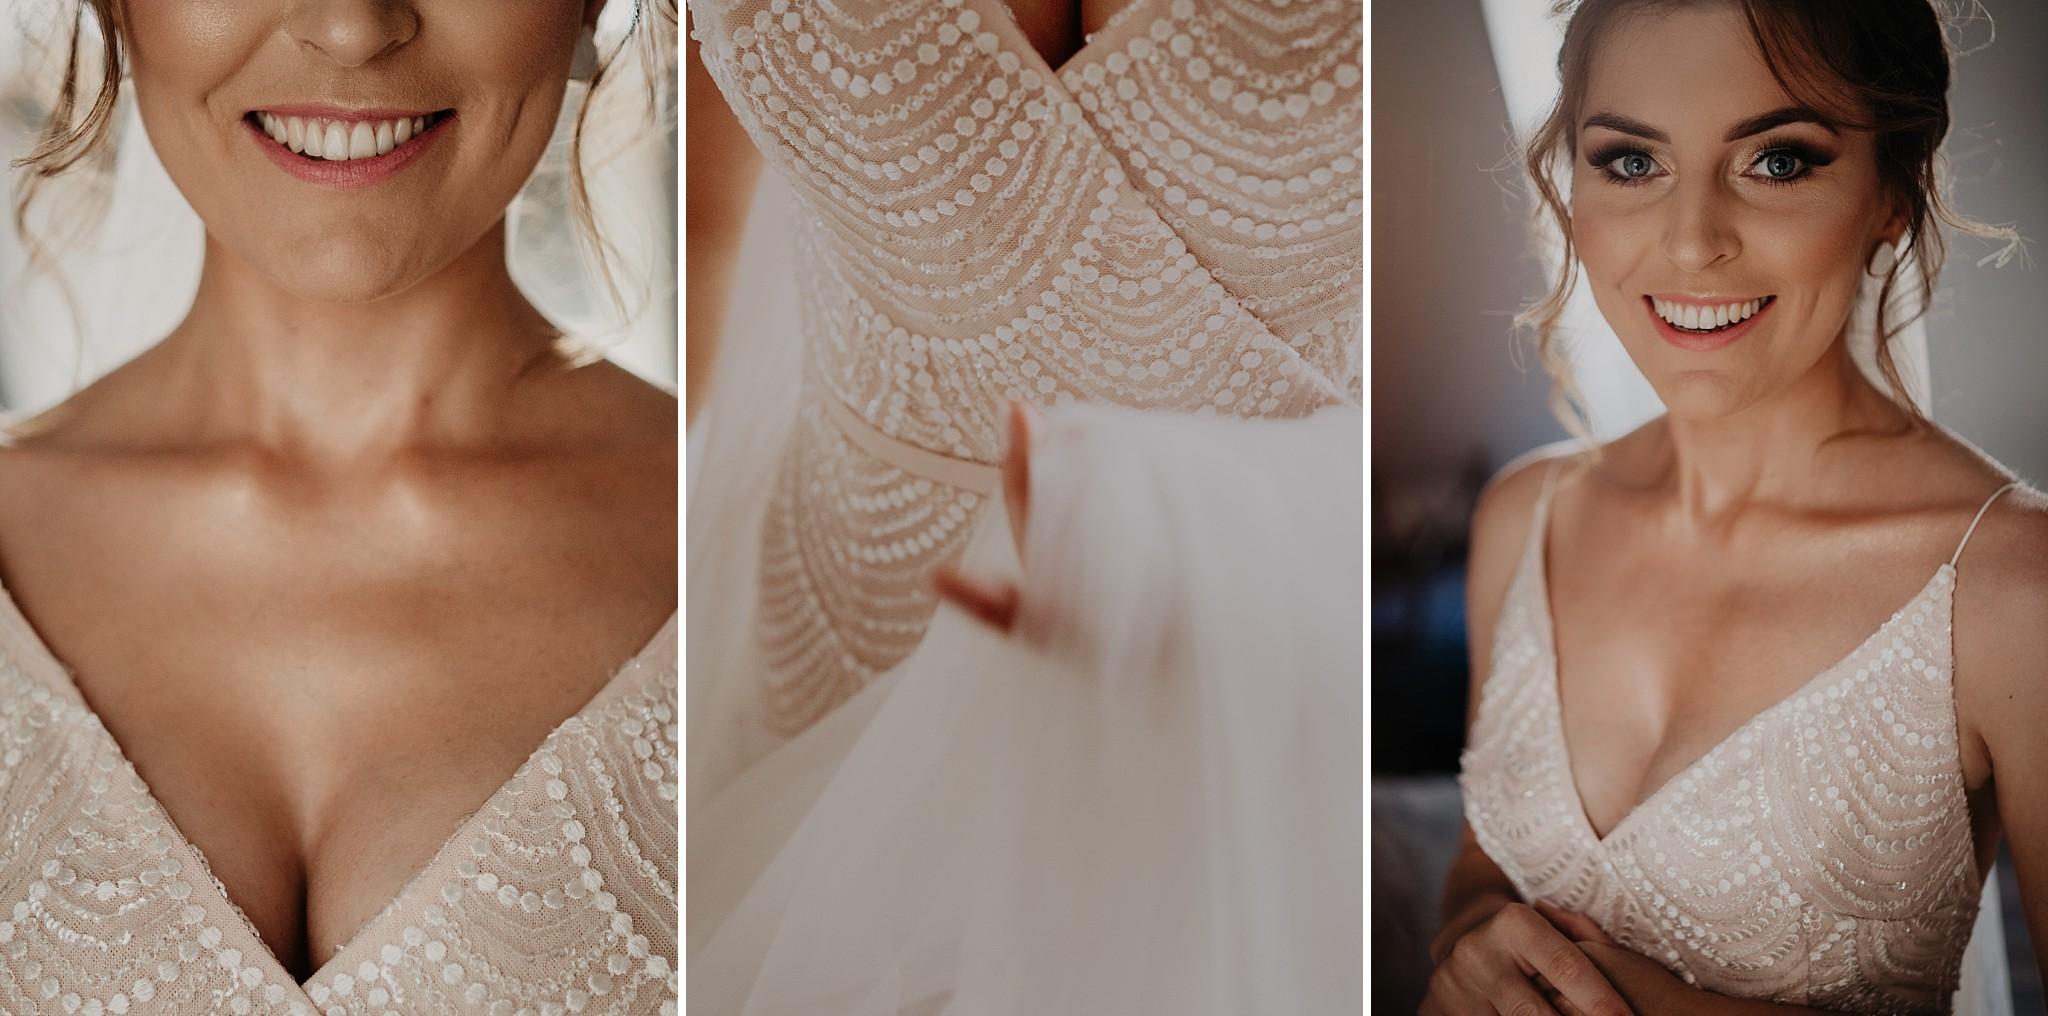 fotograf poznan wesele dobra truskawka piekne wesele pod poznaniem wesele w dobrej truskawce piekna para mloda slub marzen slub koronawirus slub listopad wesele koronawirus 084